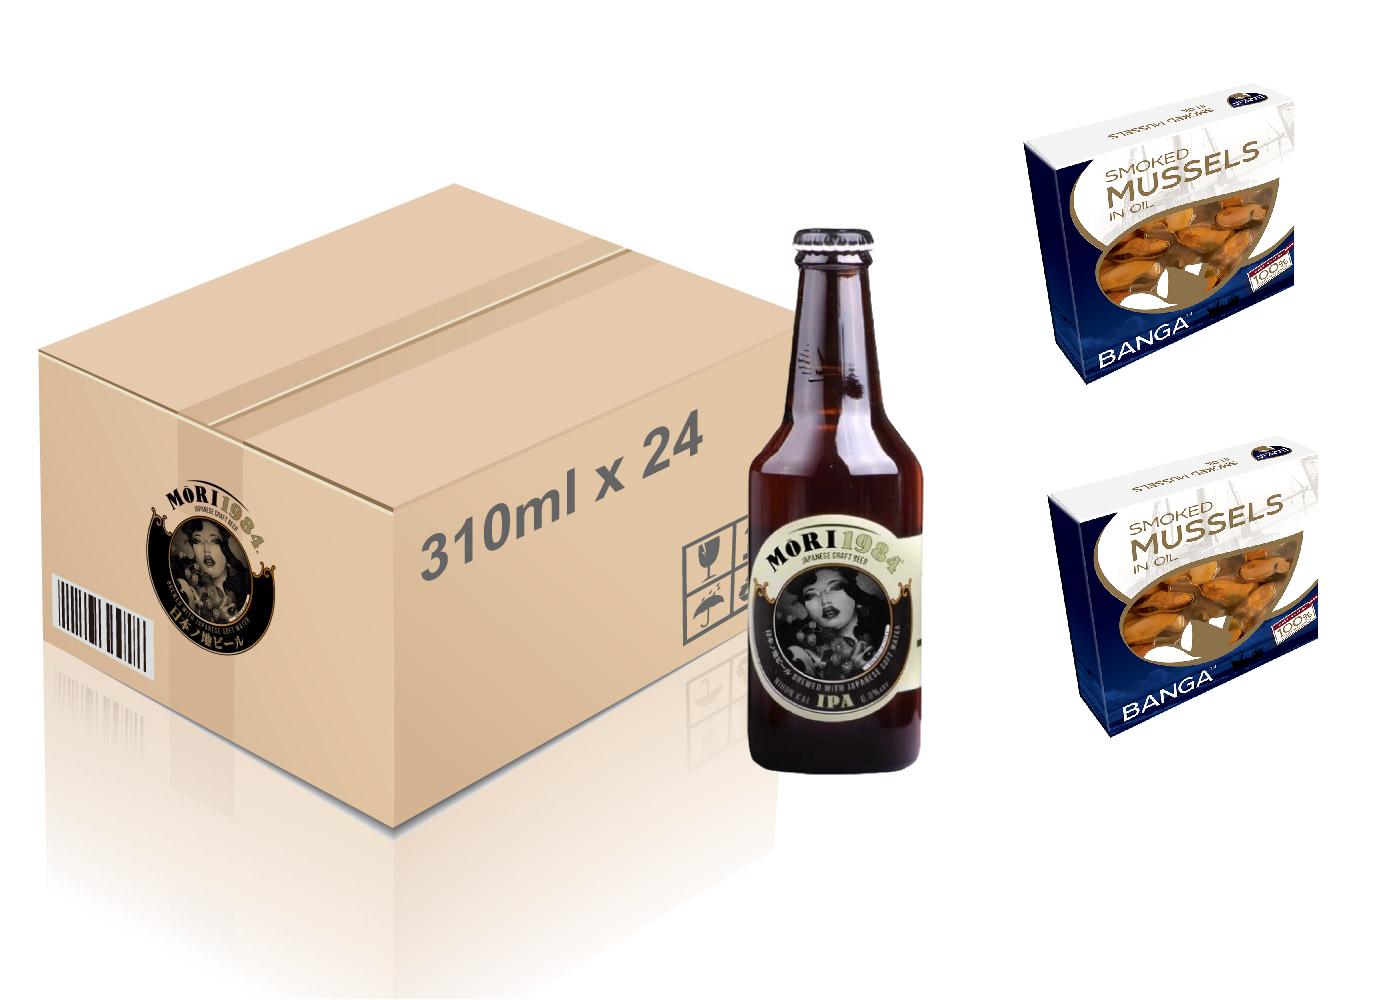 Mori 1984 - Nihon Kai IPA 手工啤酒 310ml x 24 枝(一箱)+ Banga 烟燻油浸青口 120g (2 罐)